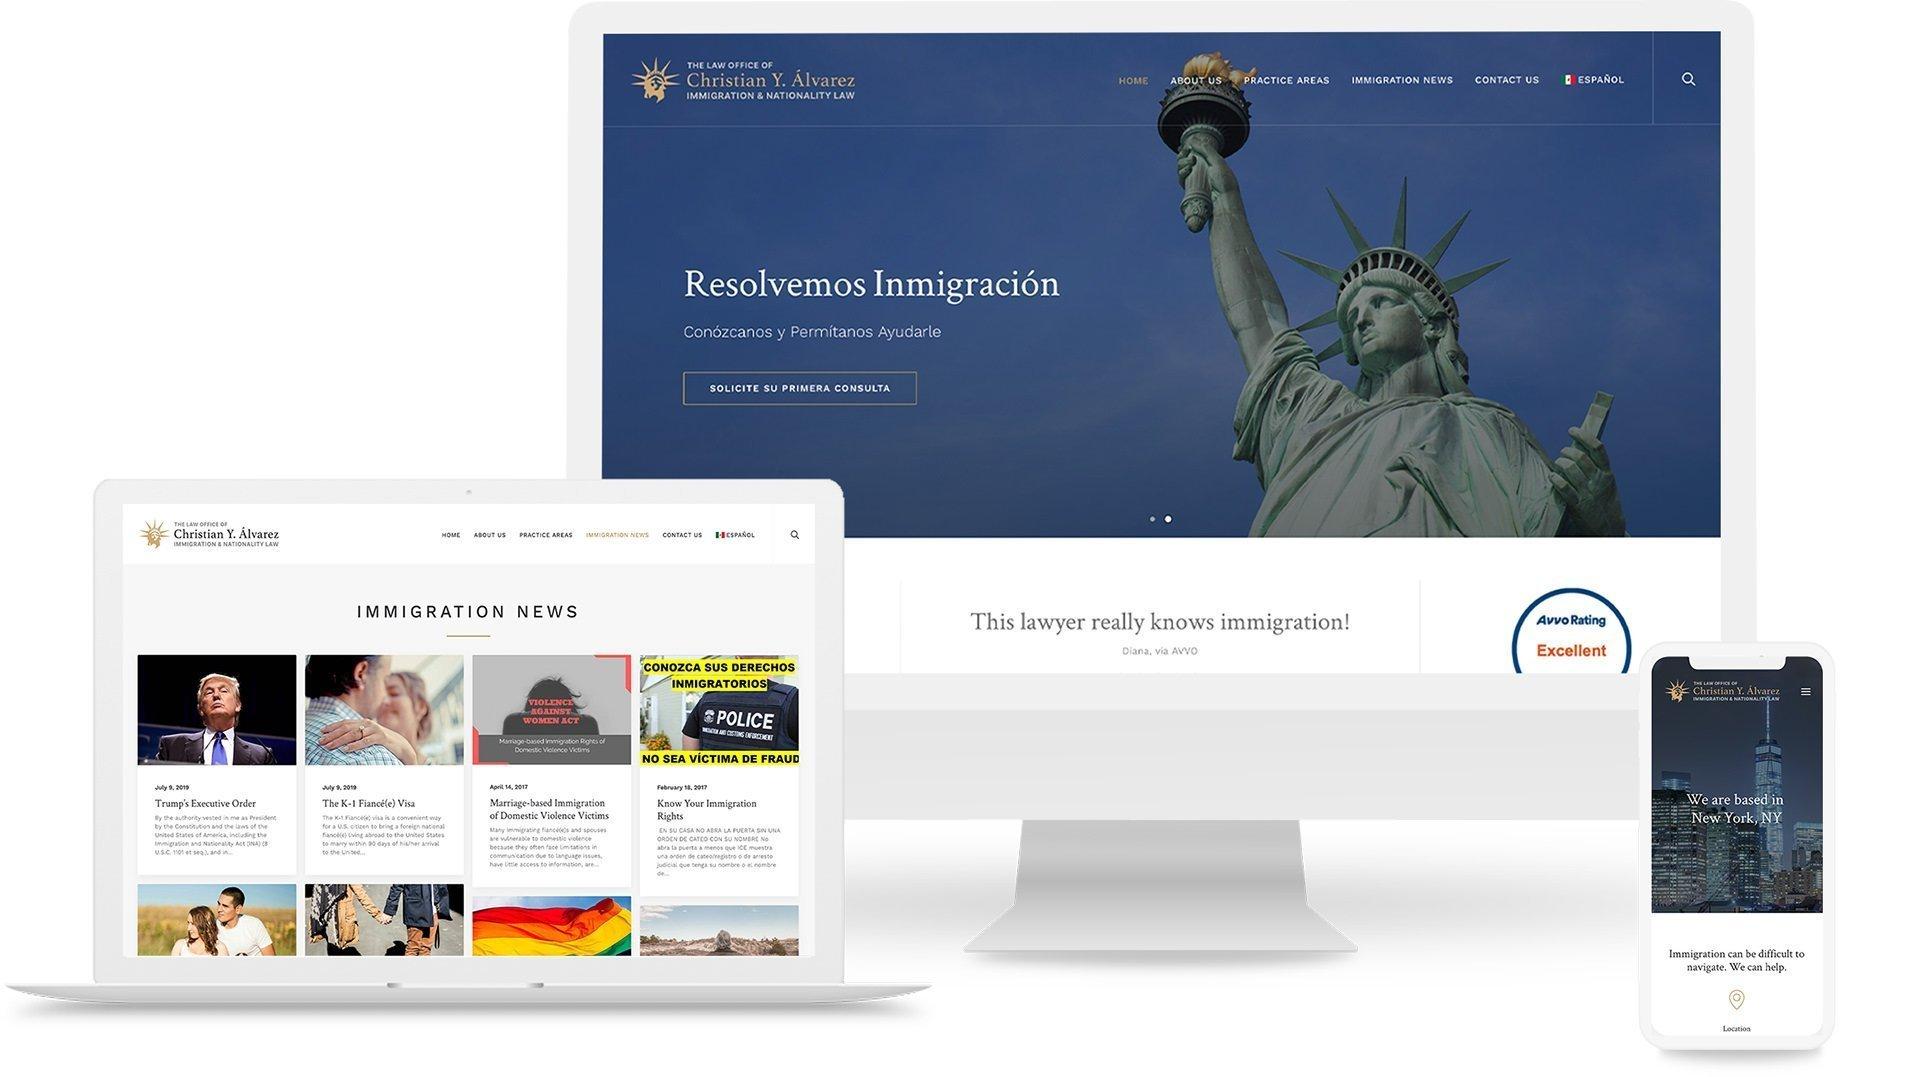 Christian Y. Alvarez Law website by Beri Group